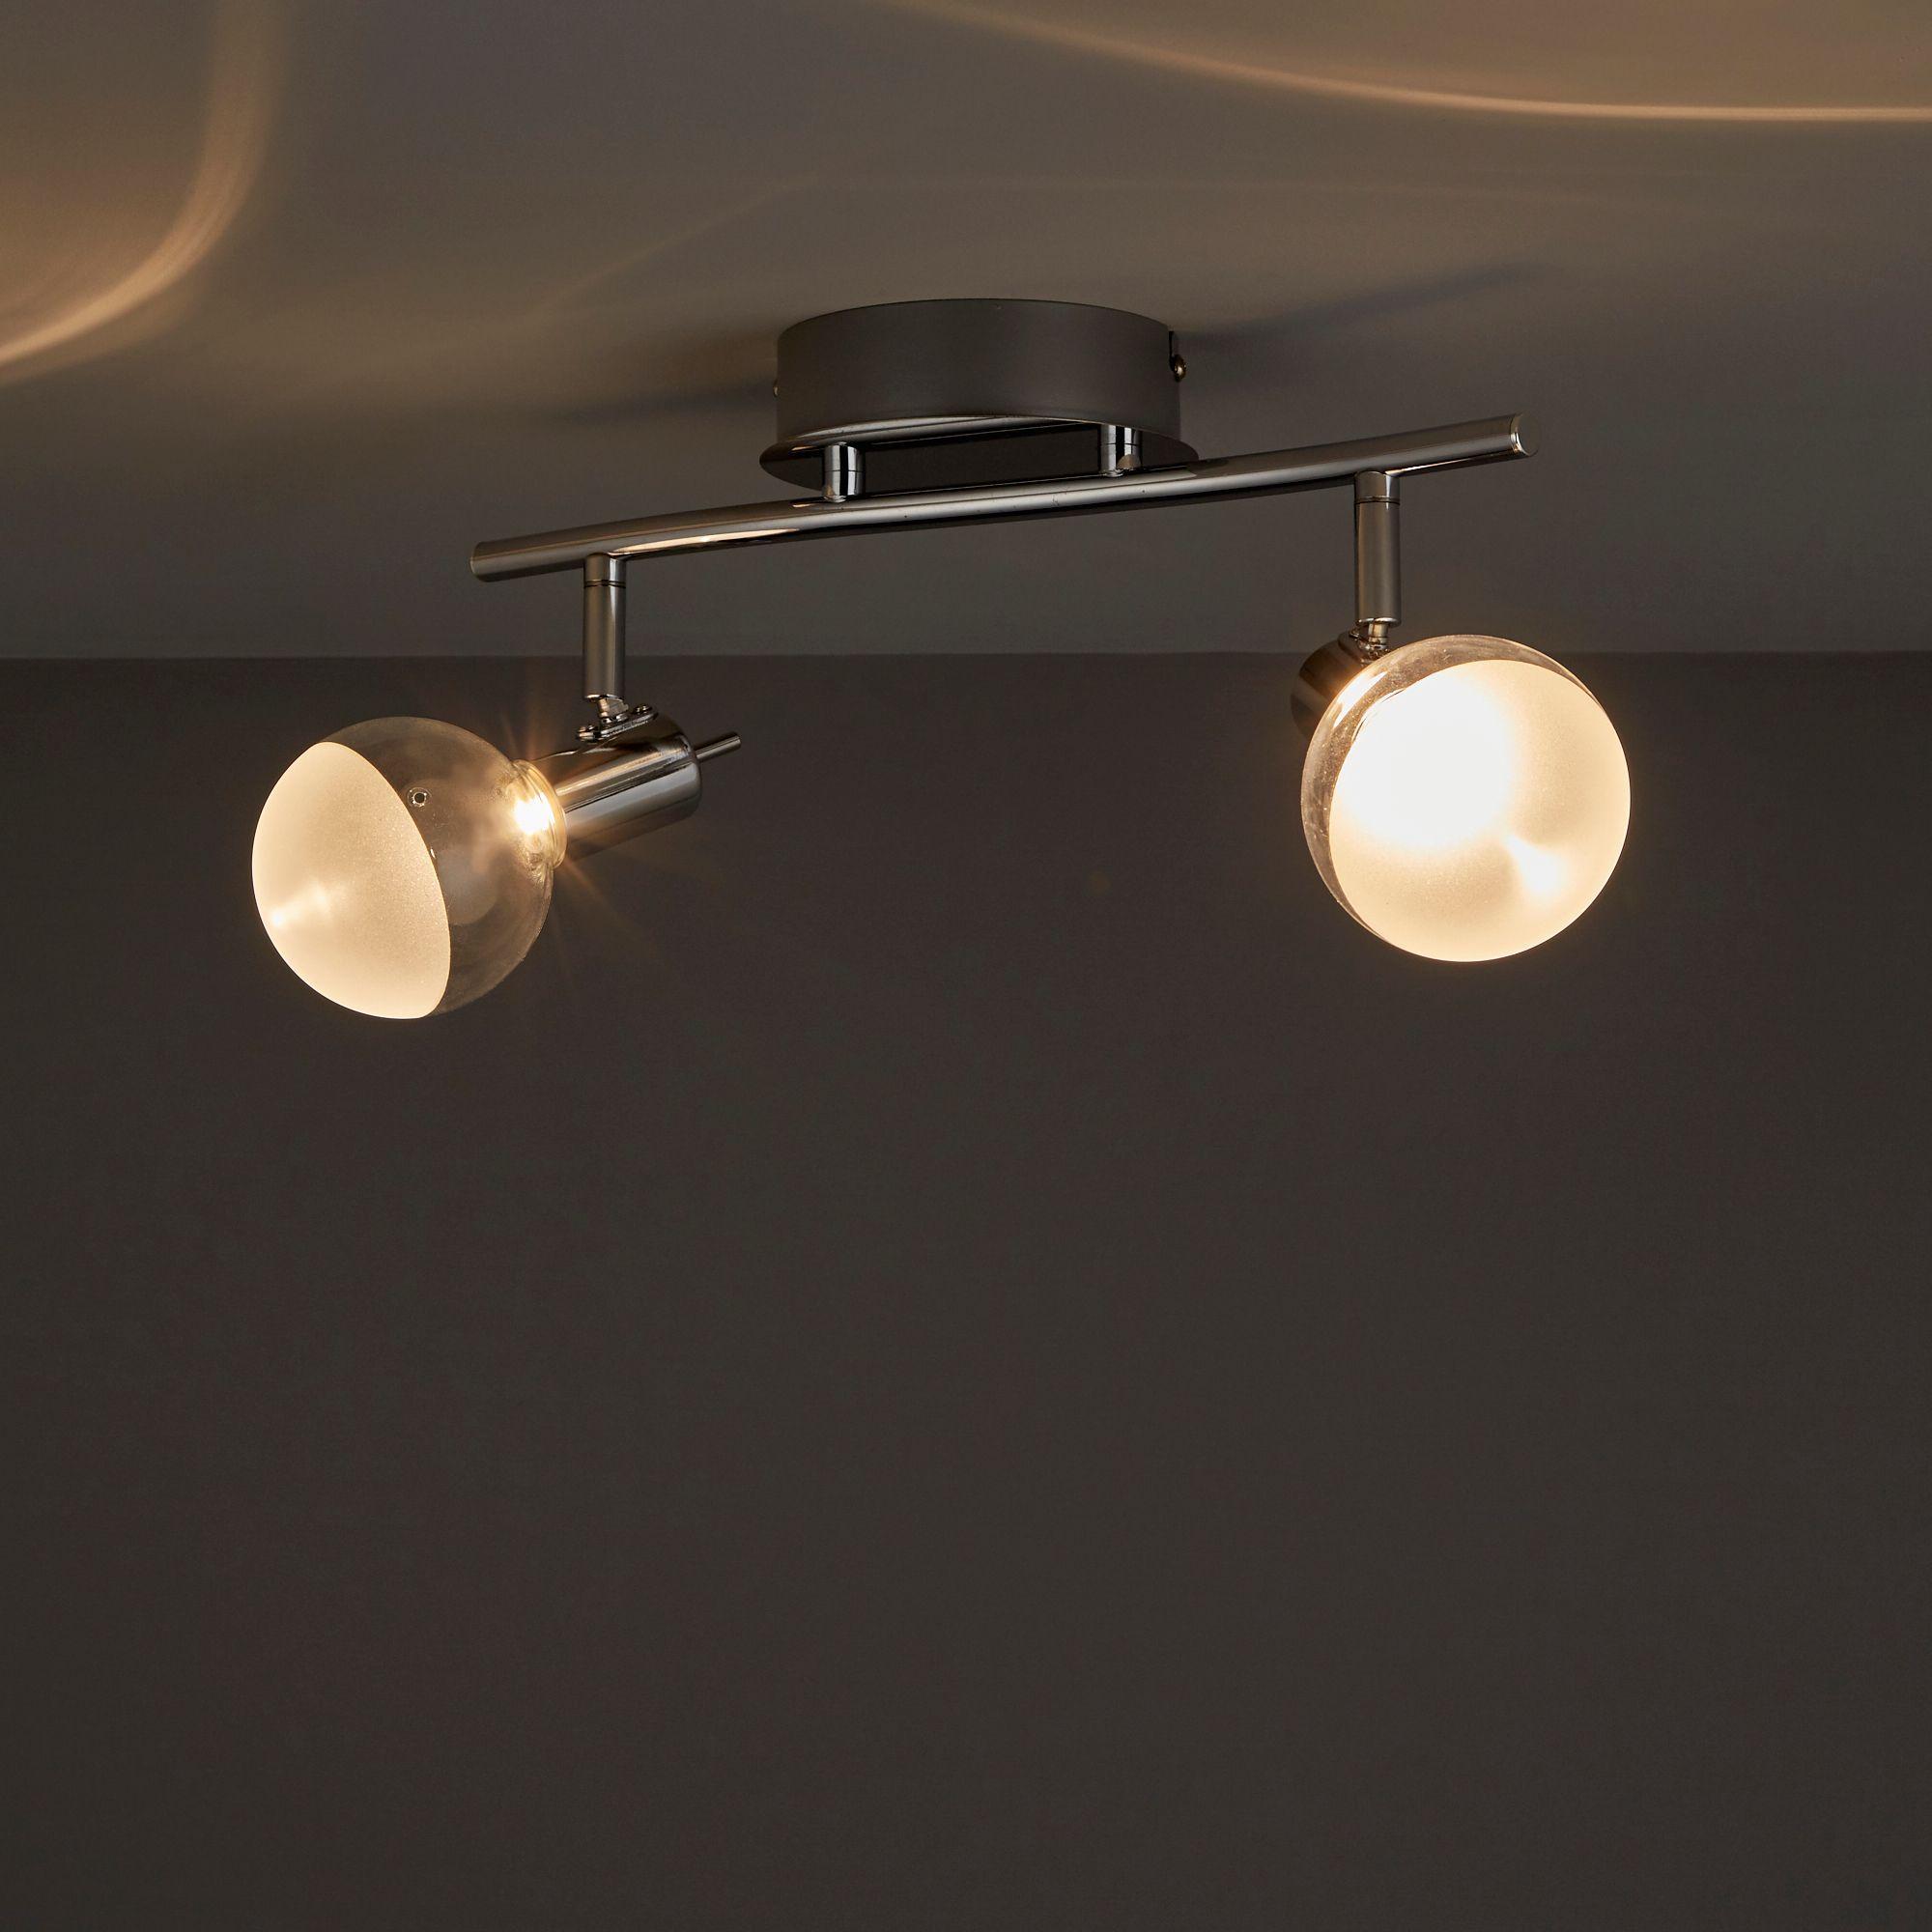 Panacea Chrome effect 2 Lamp Spotlight